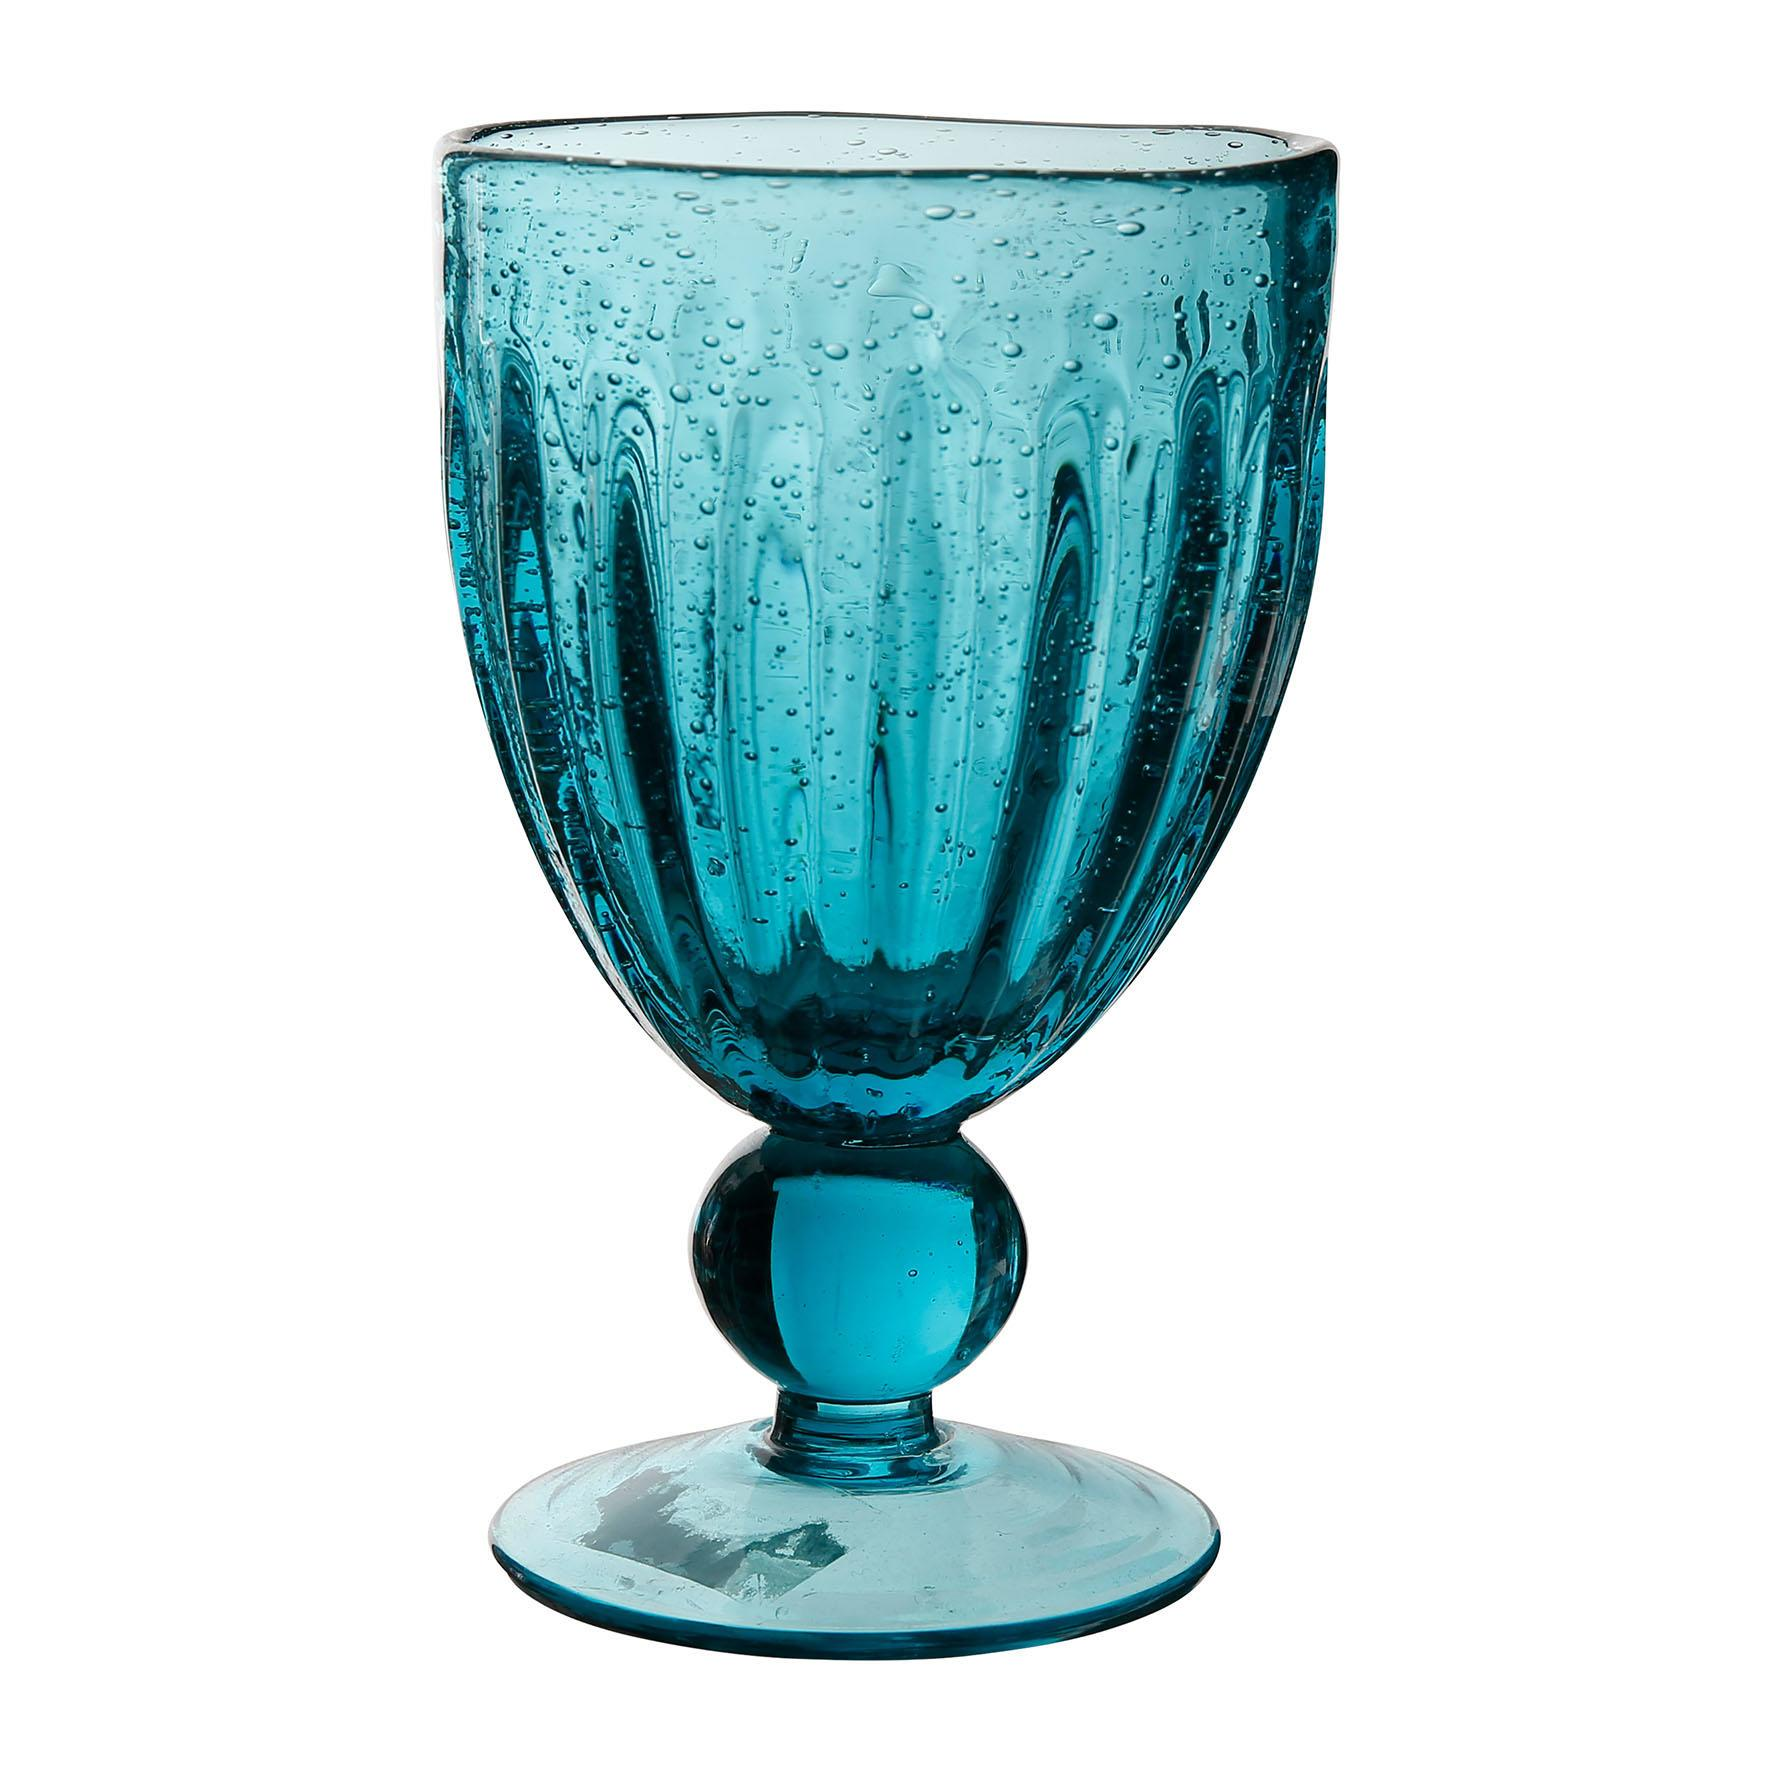 CÔTÉ TABLE Sklenice na víno - Pernille Bleu, modrá barva, čirá barva, sklo